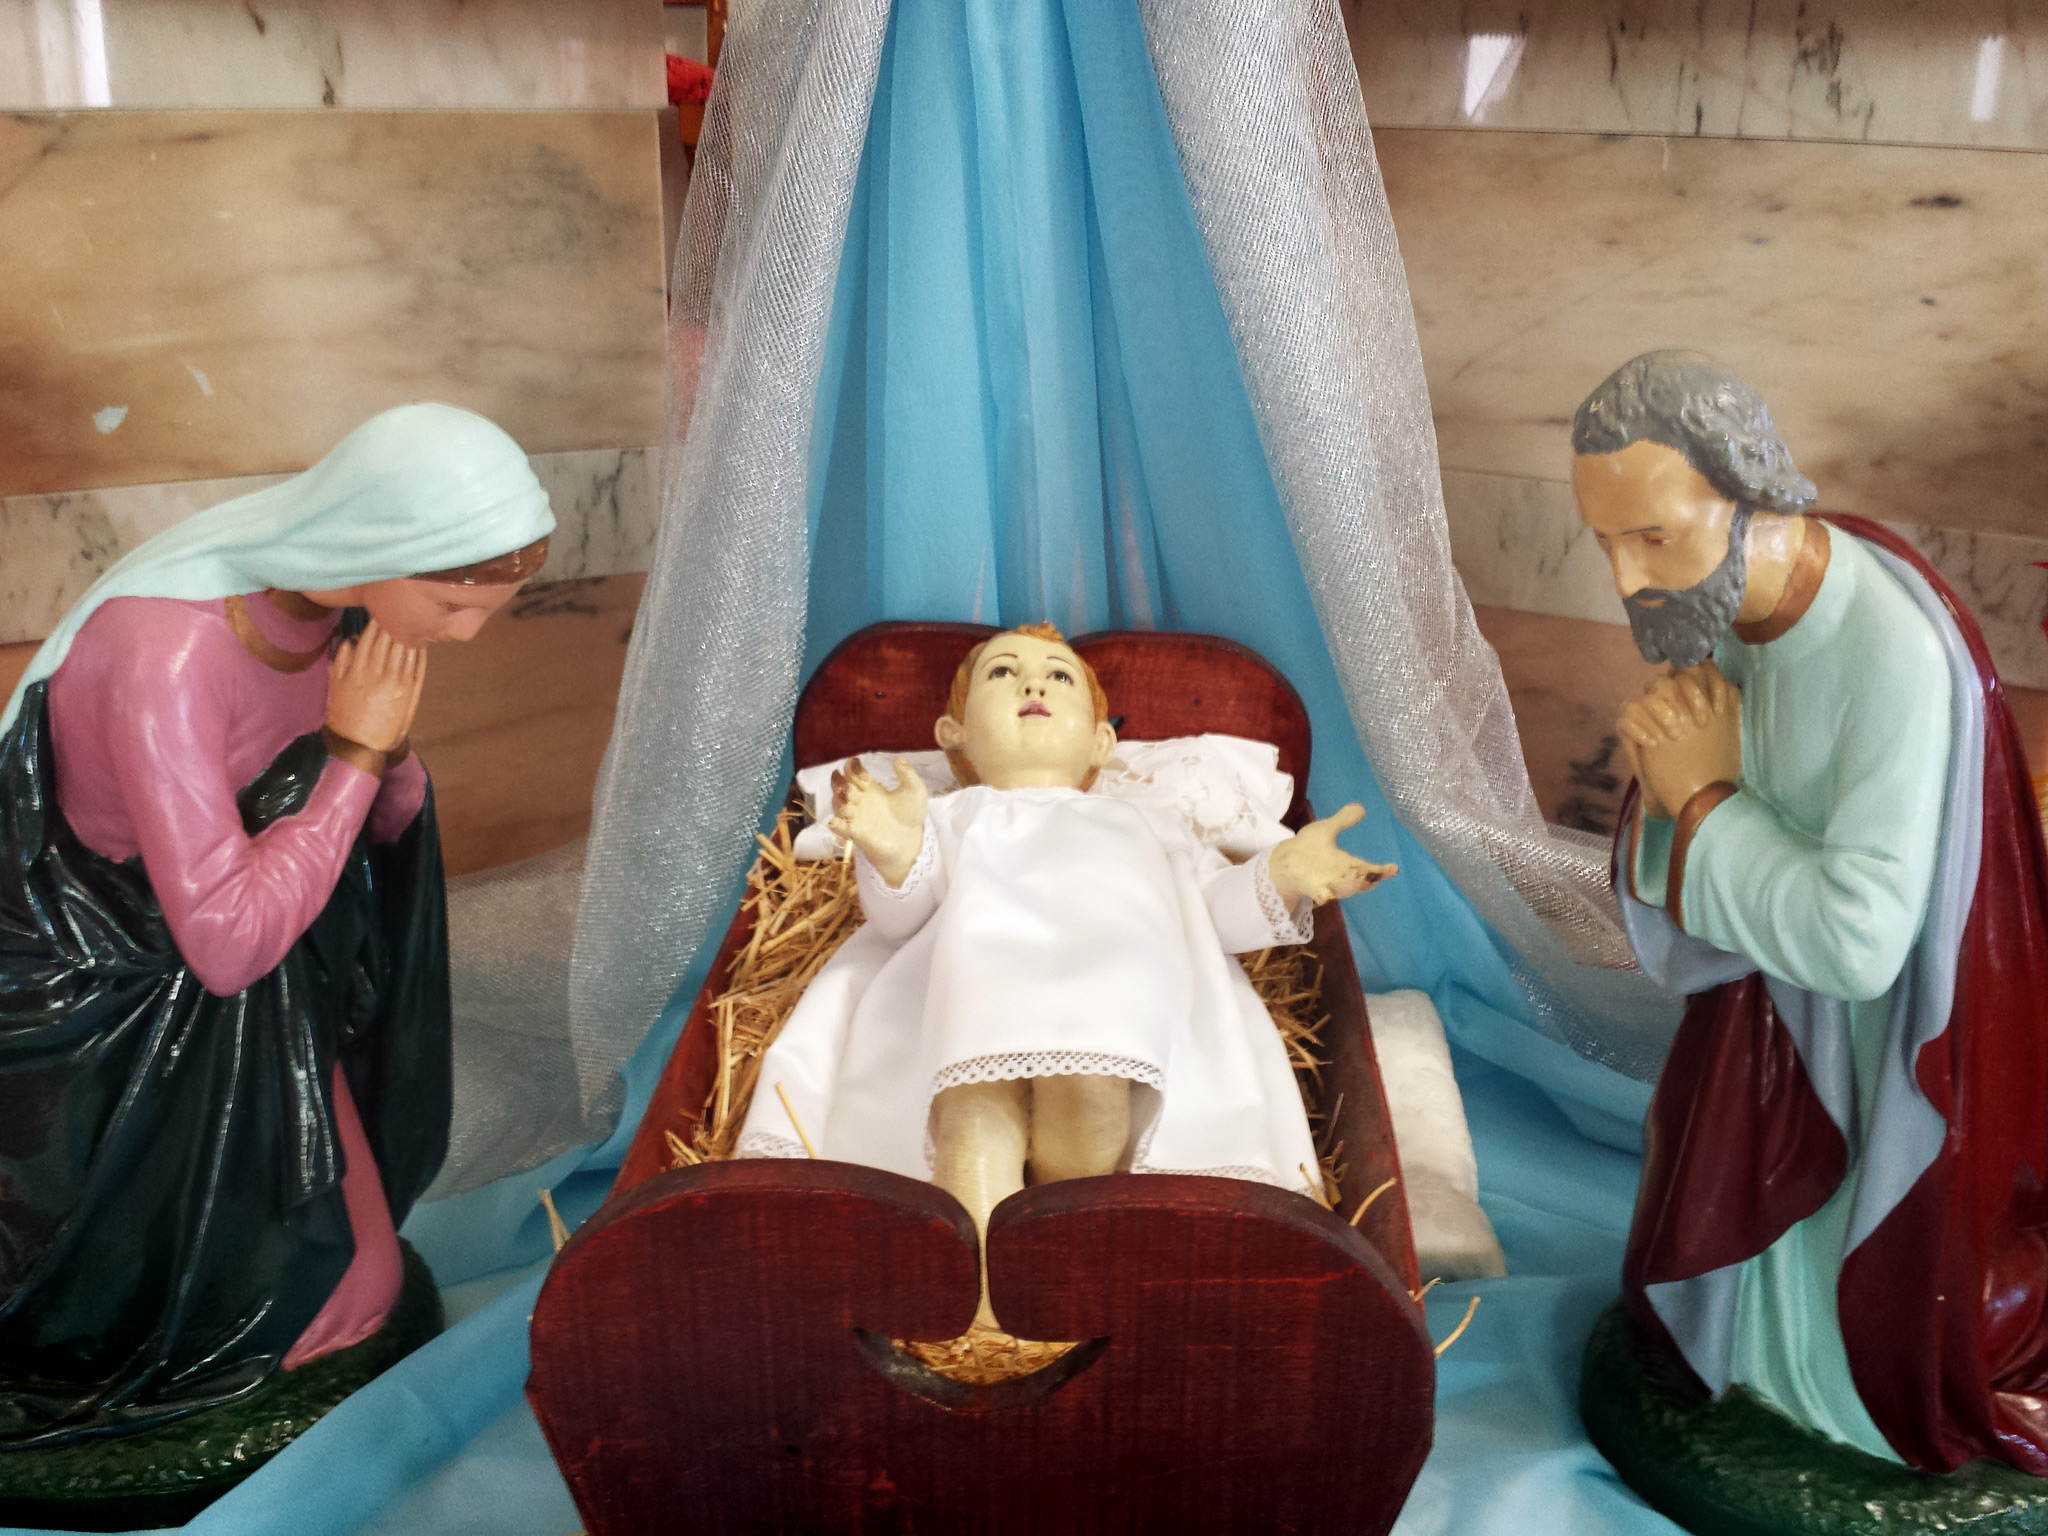 Gesu-Bambino-Sacra-Famiglia-presepe